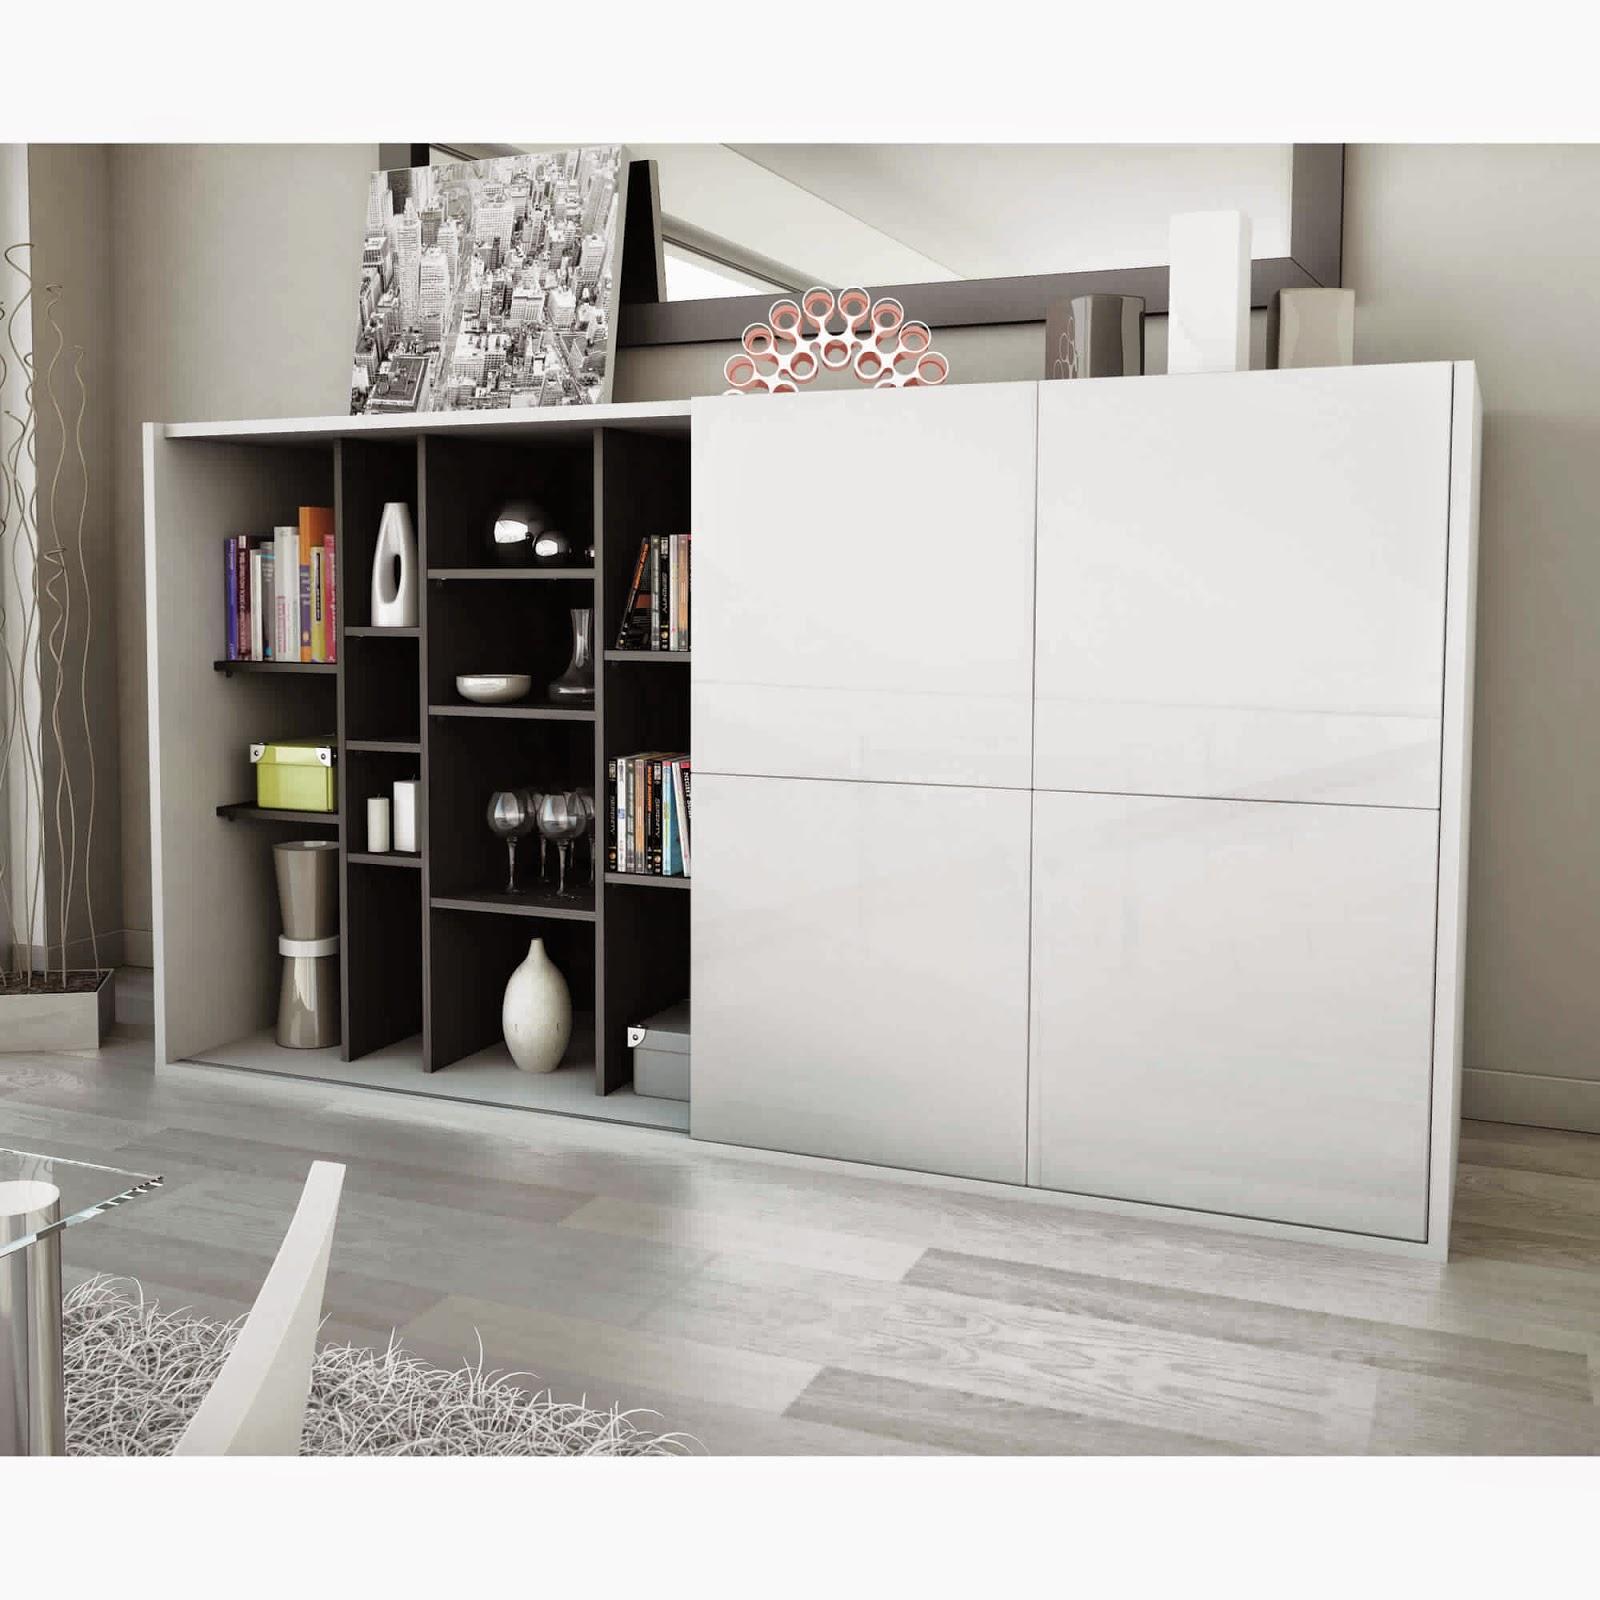 Meuble tv avec porte coulissante meuble tv for Meuble tv